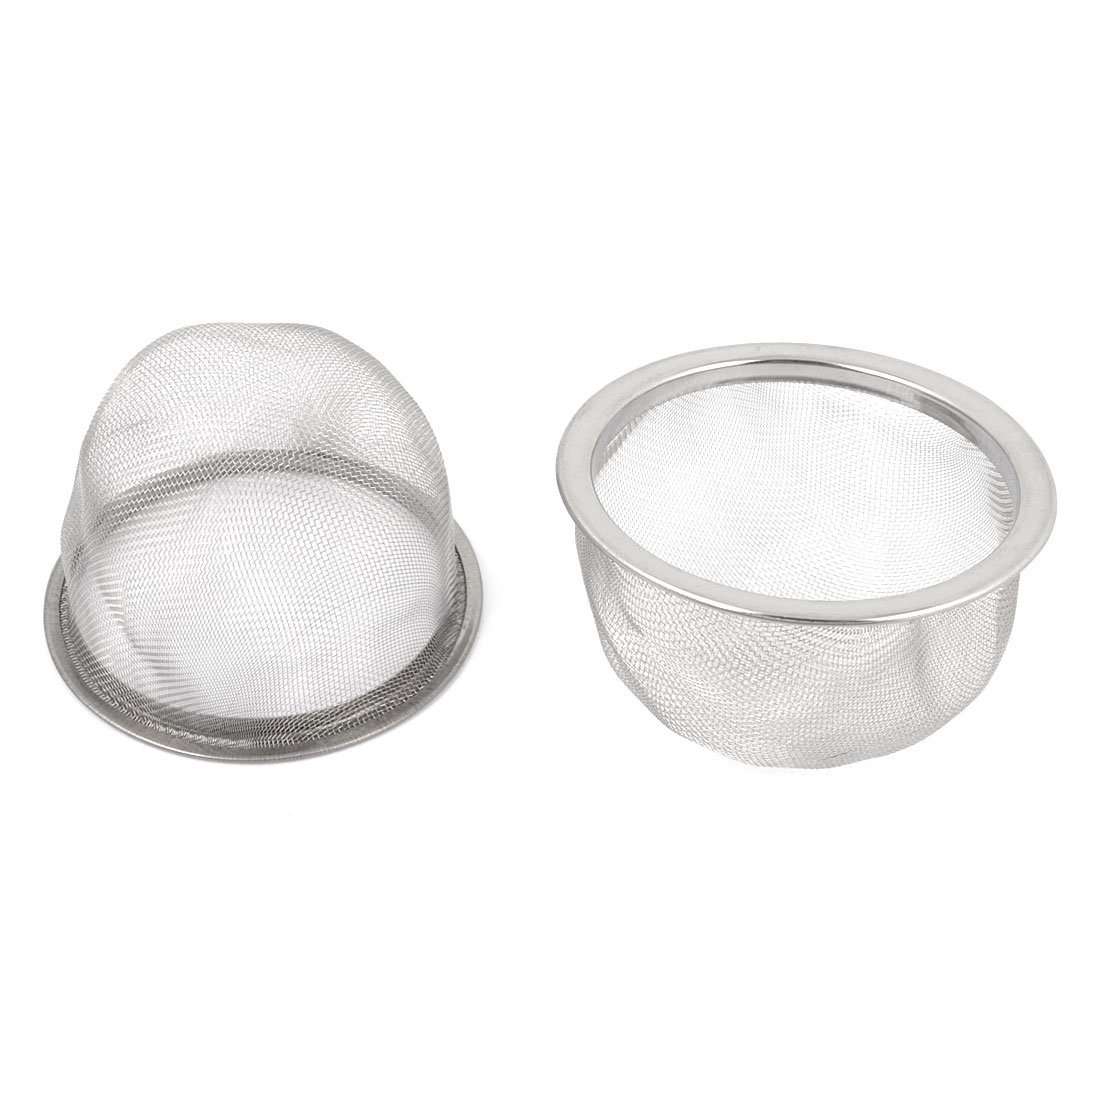 2 Pcs Stainless Steel Drainer Mesh Tea Strainer Teapot Filter Silver